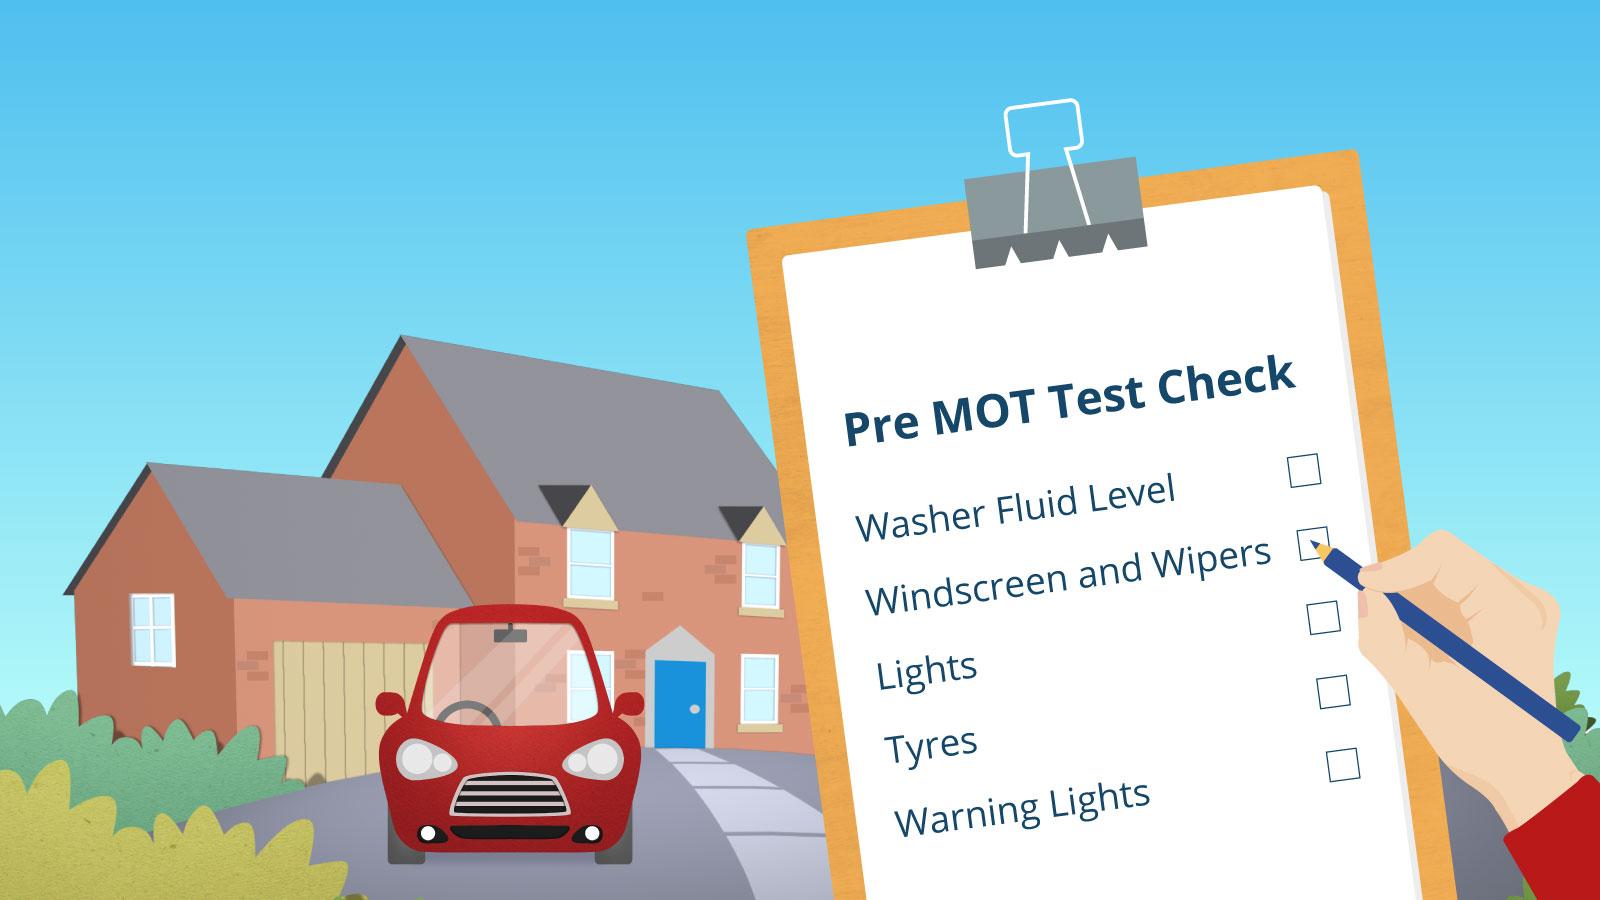 Pre MOT Test Checklist